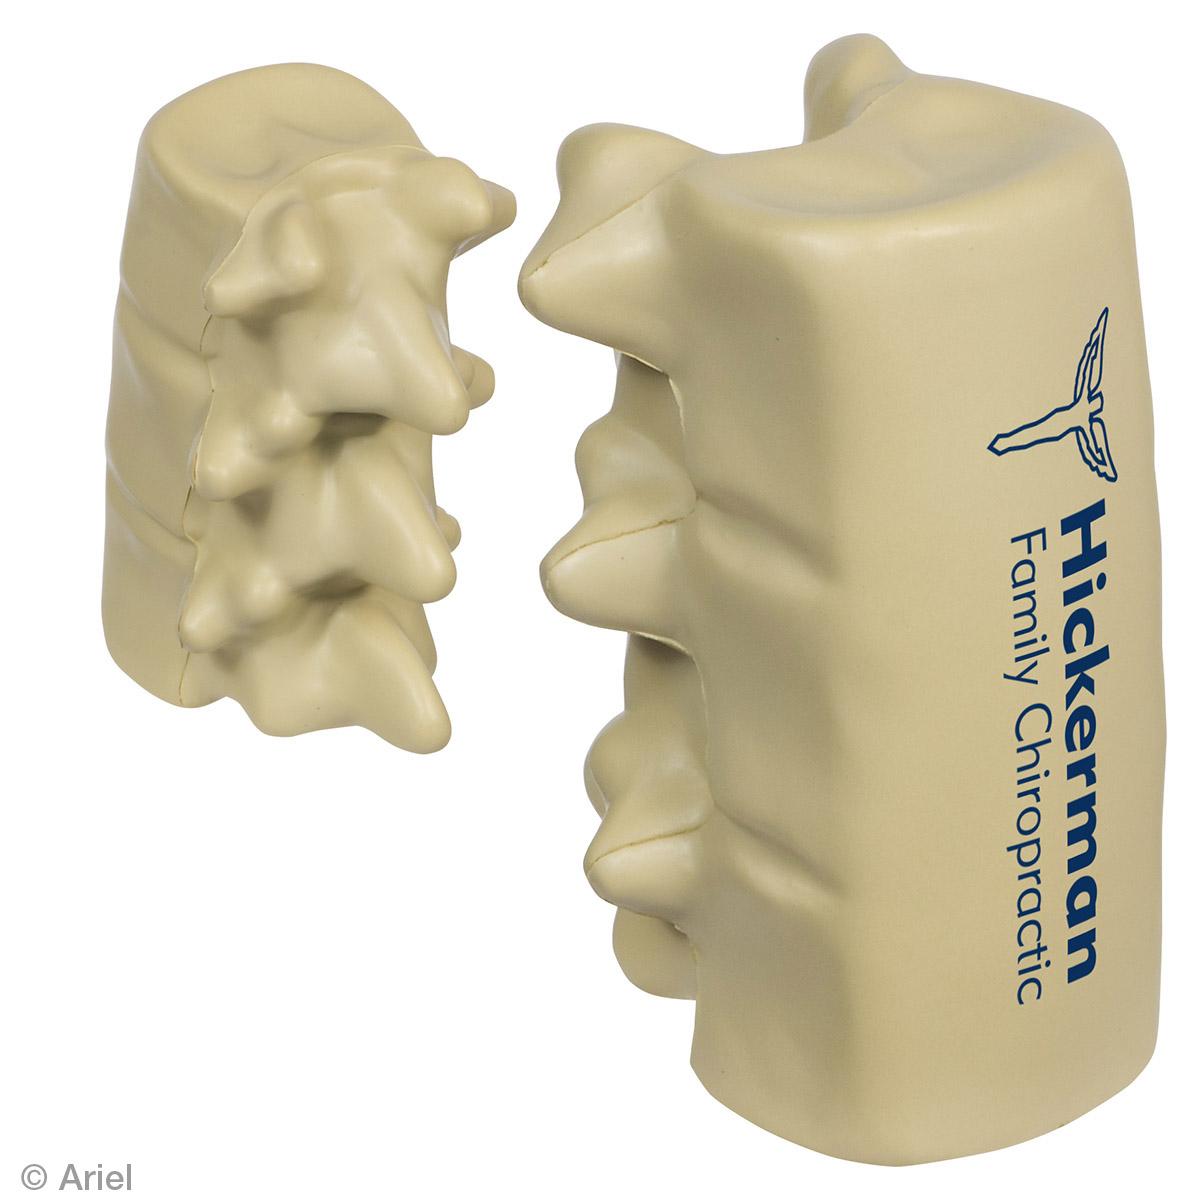 Spinal Segment Stress Reliever, LAN-SP15, 1 Colour Imprint